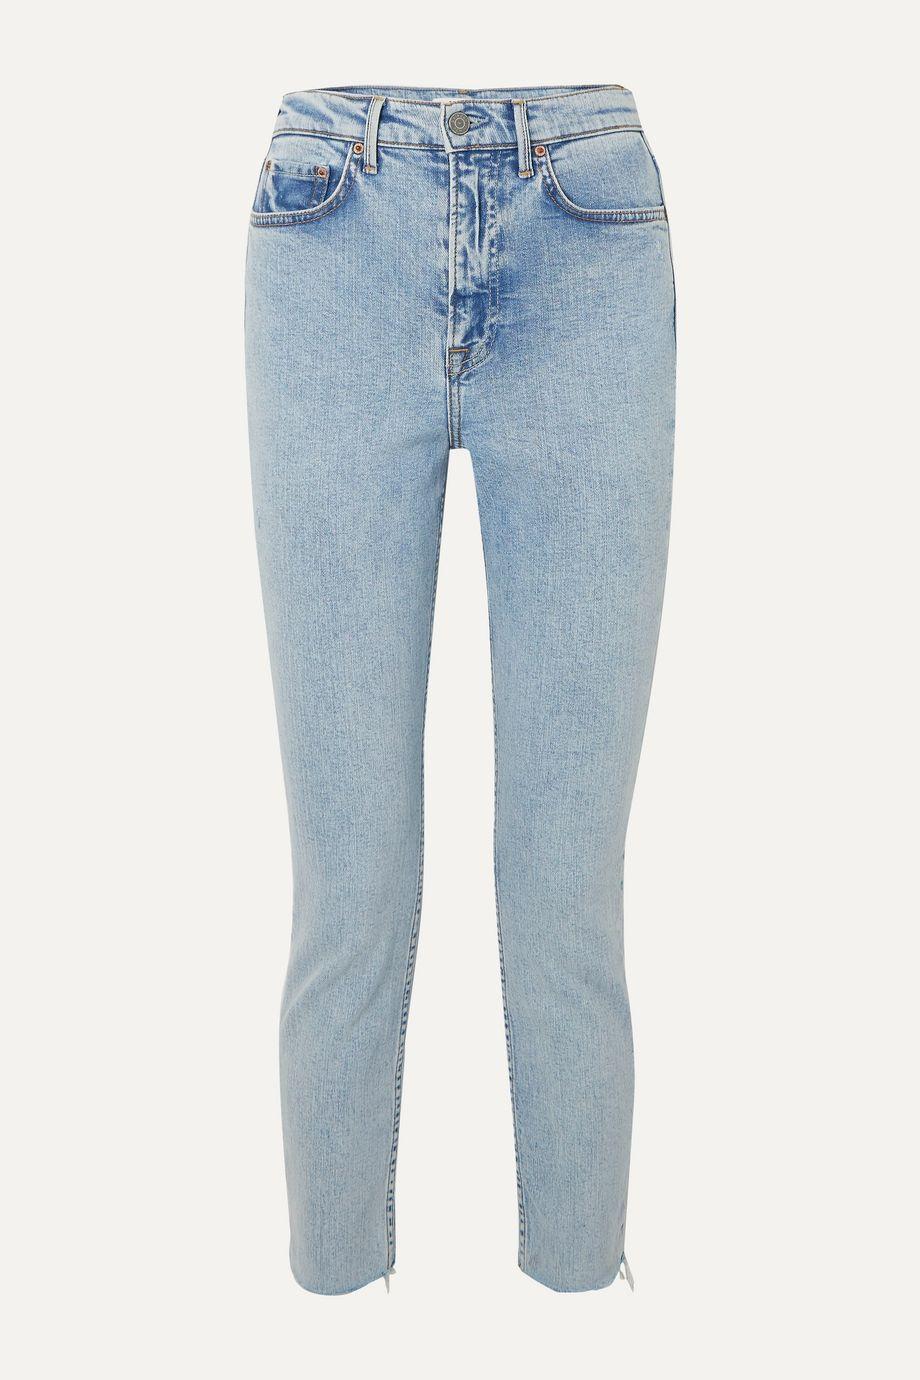 GRLFRND Karolina frayed high-rise slim-leg jeans